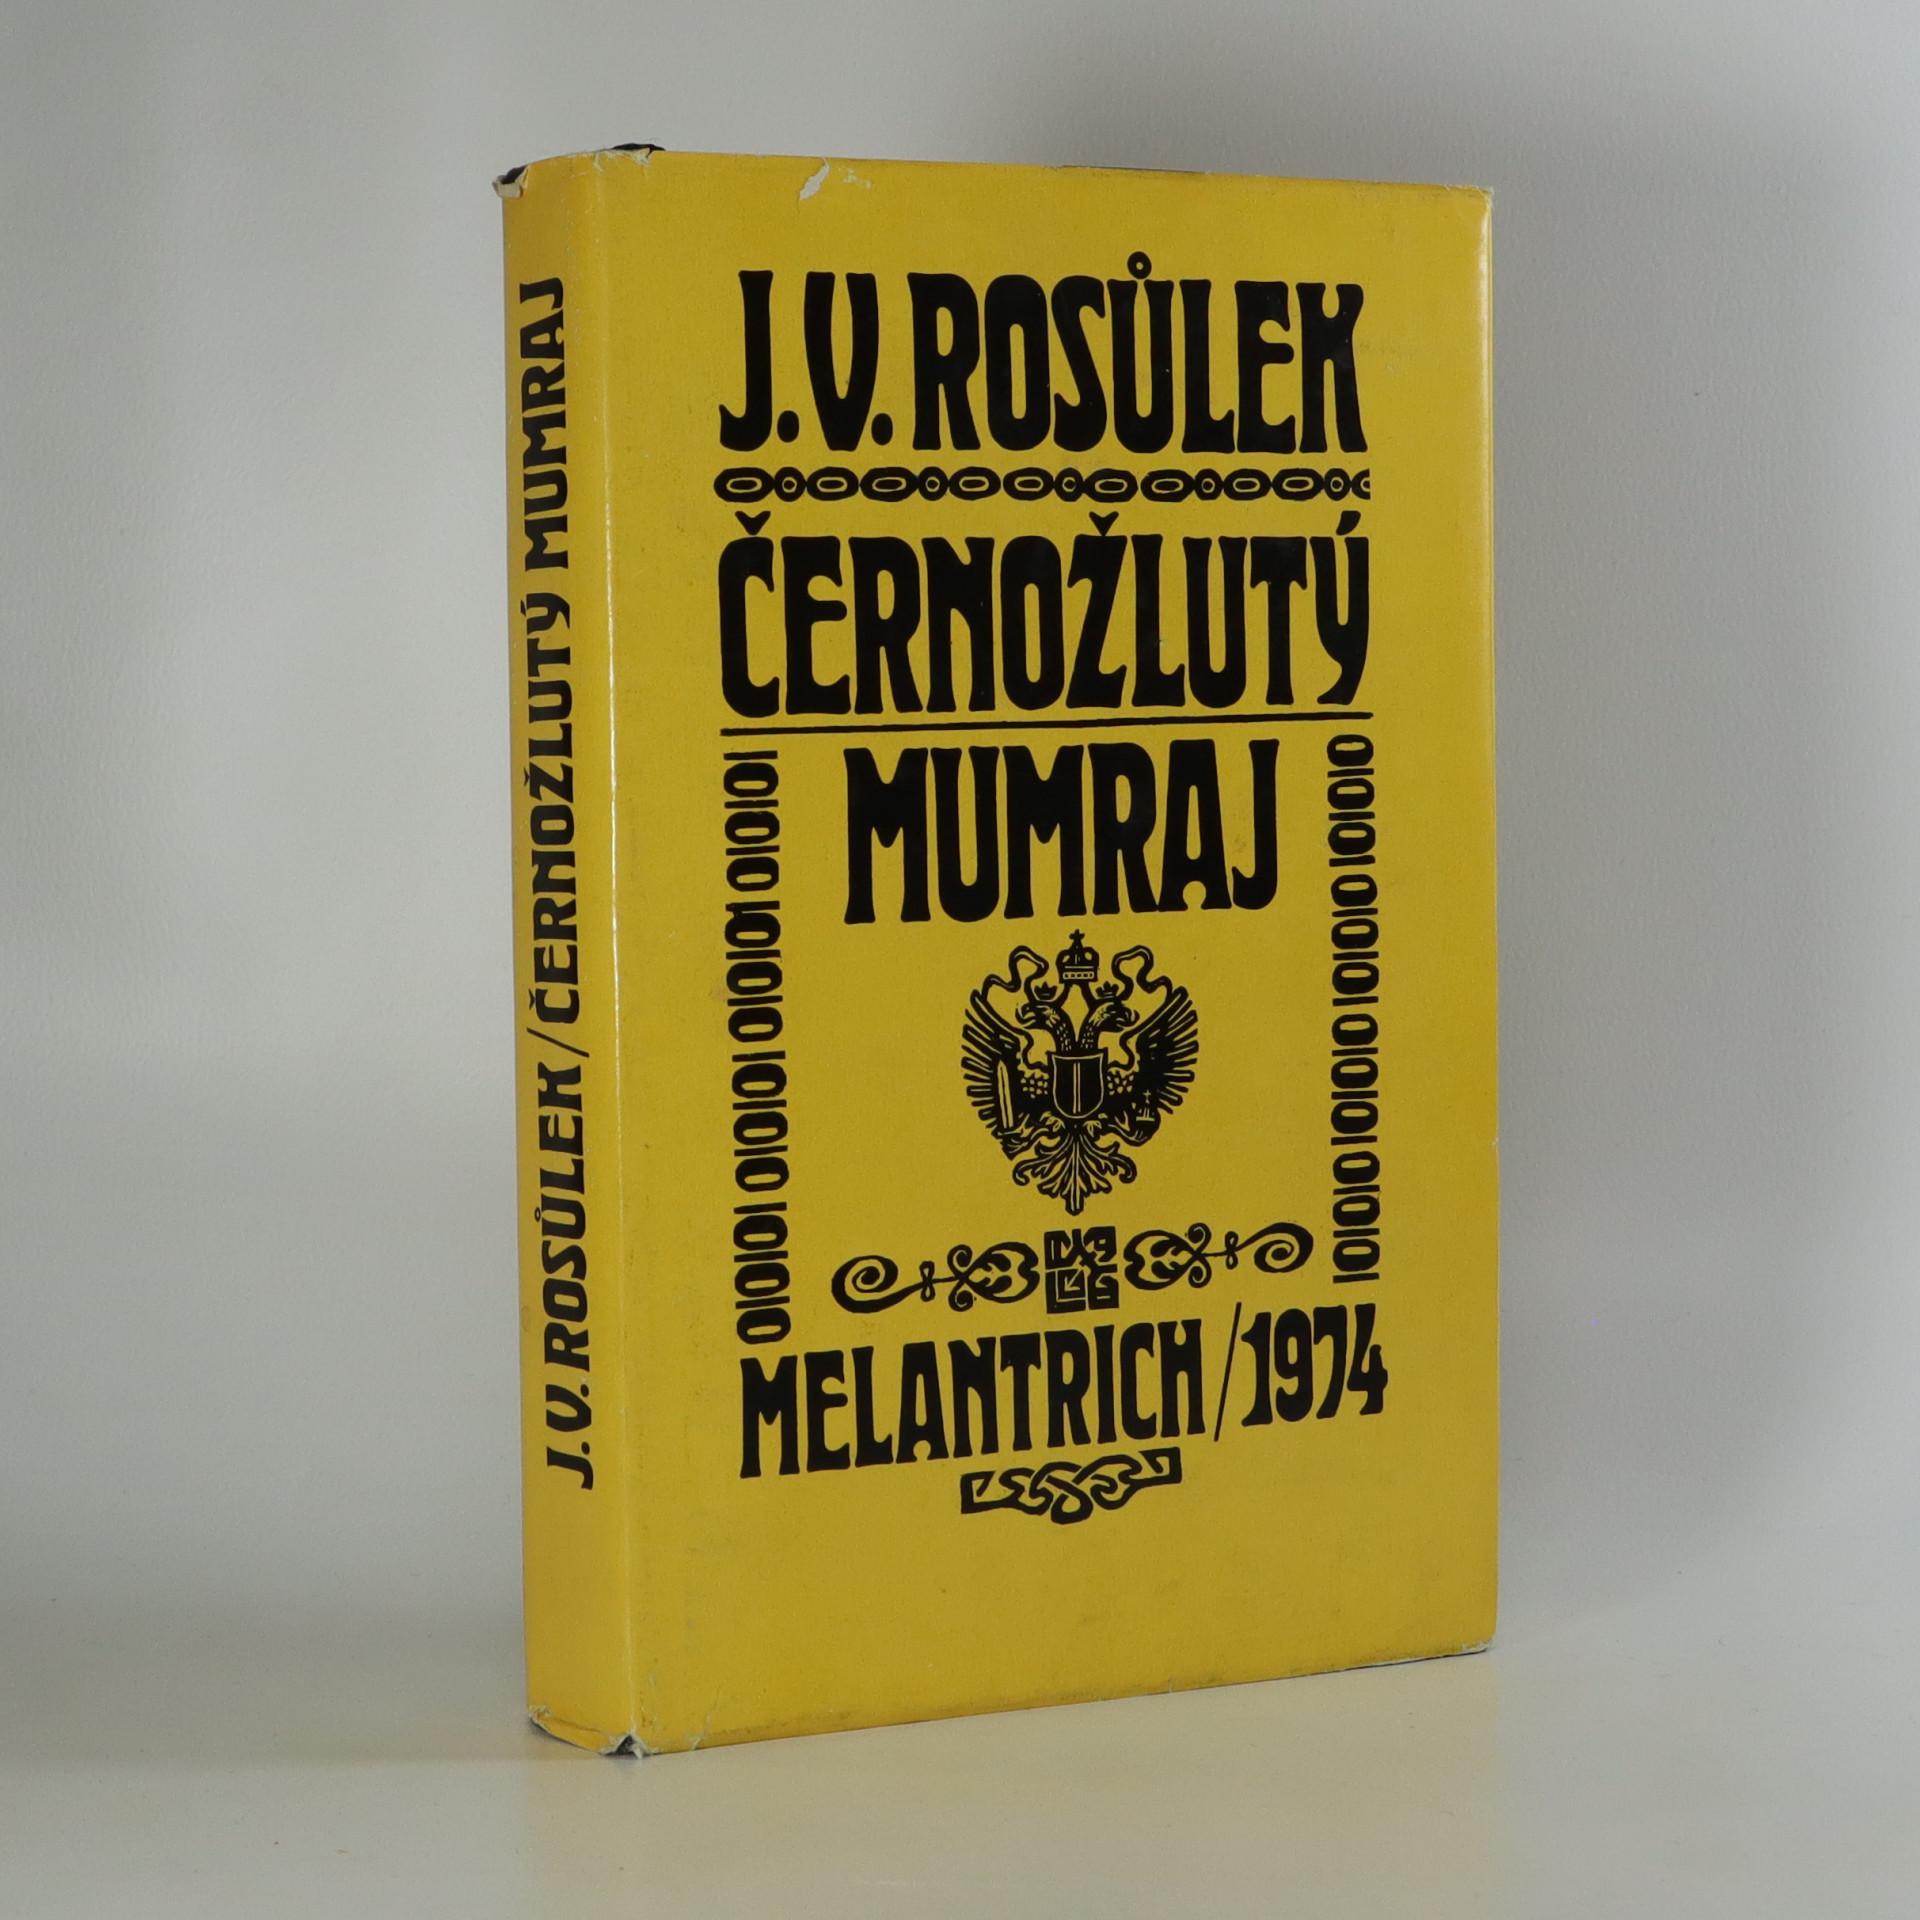 antikvární kniha Černožlutý mumraj, 1974